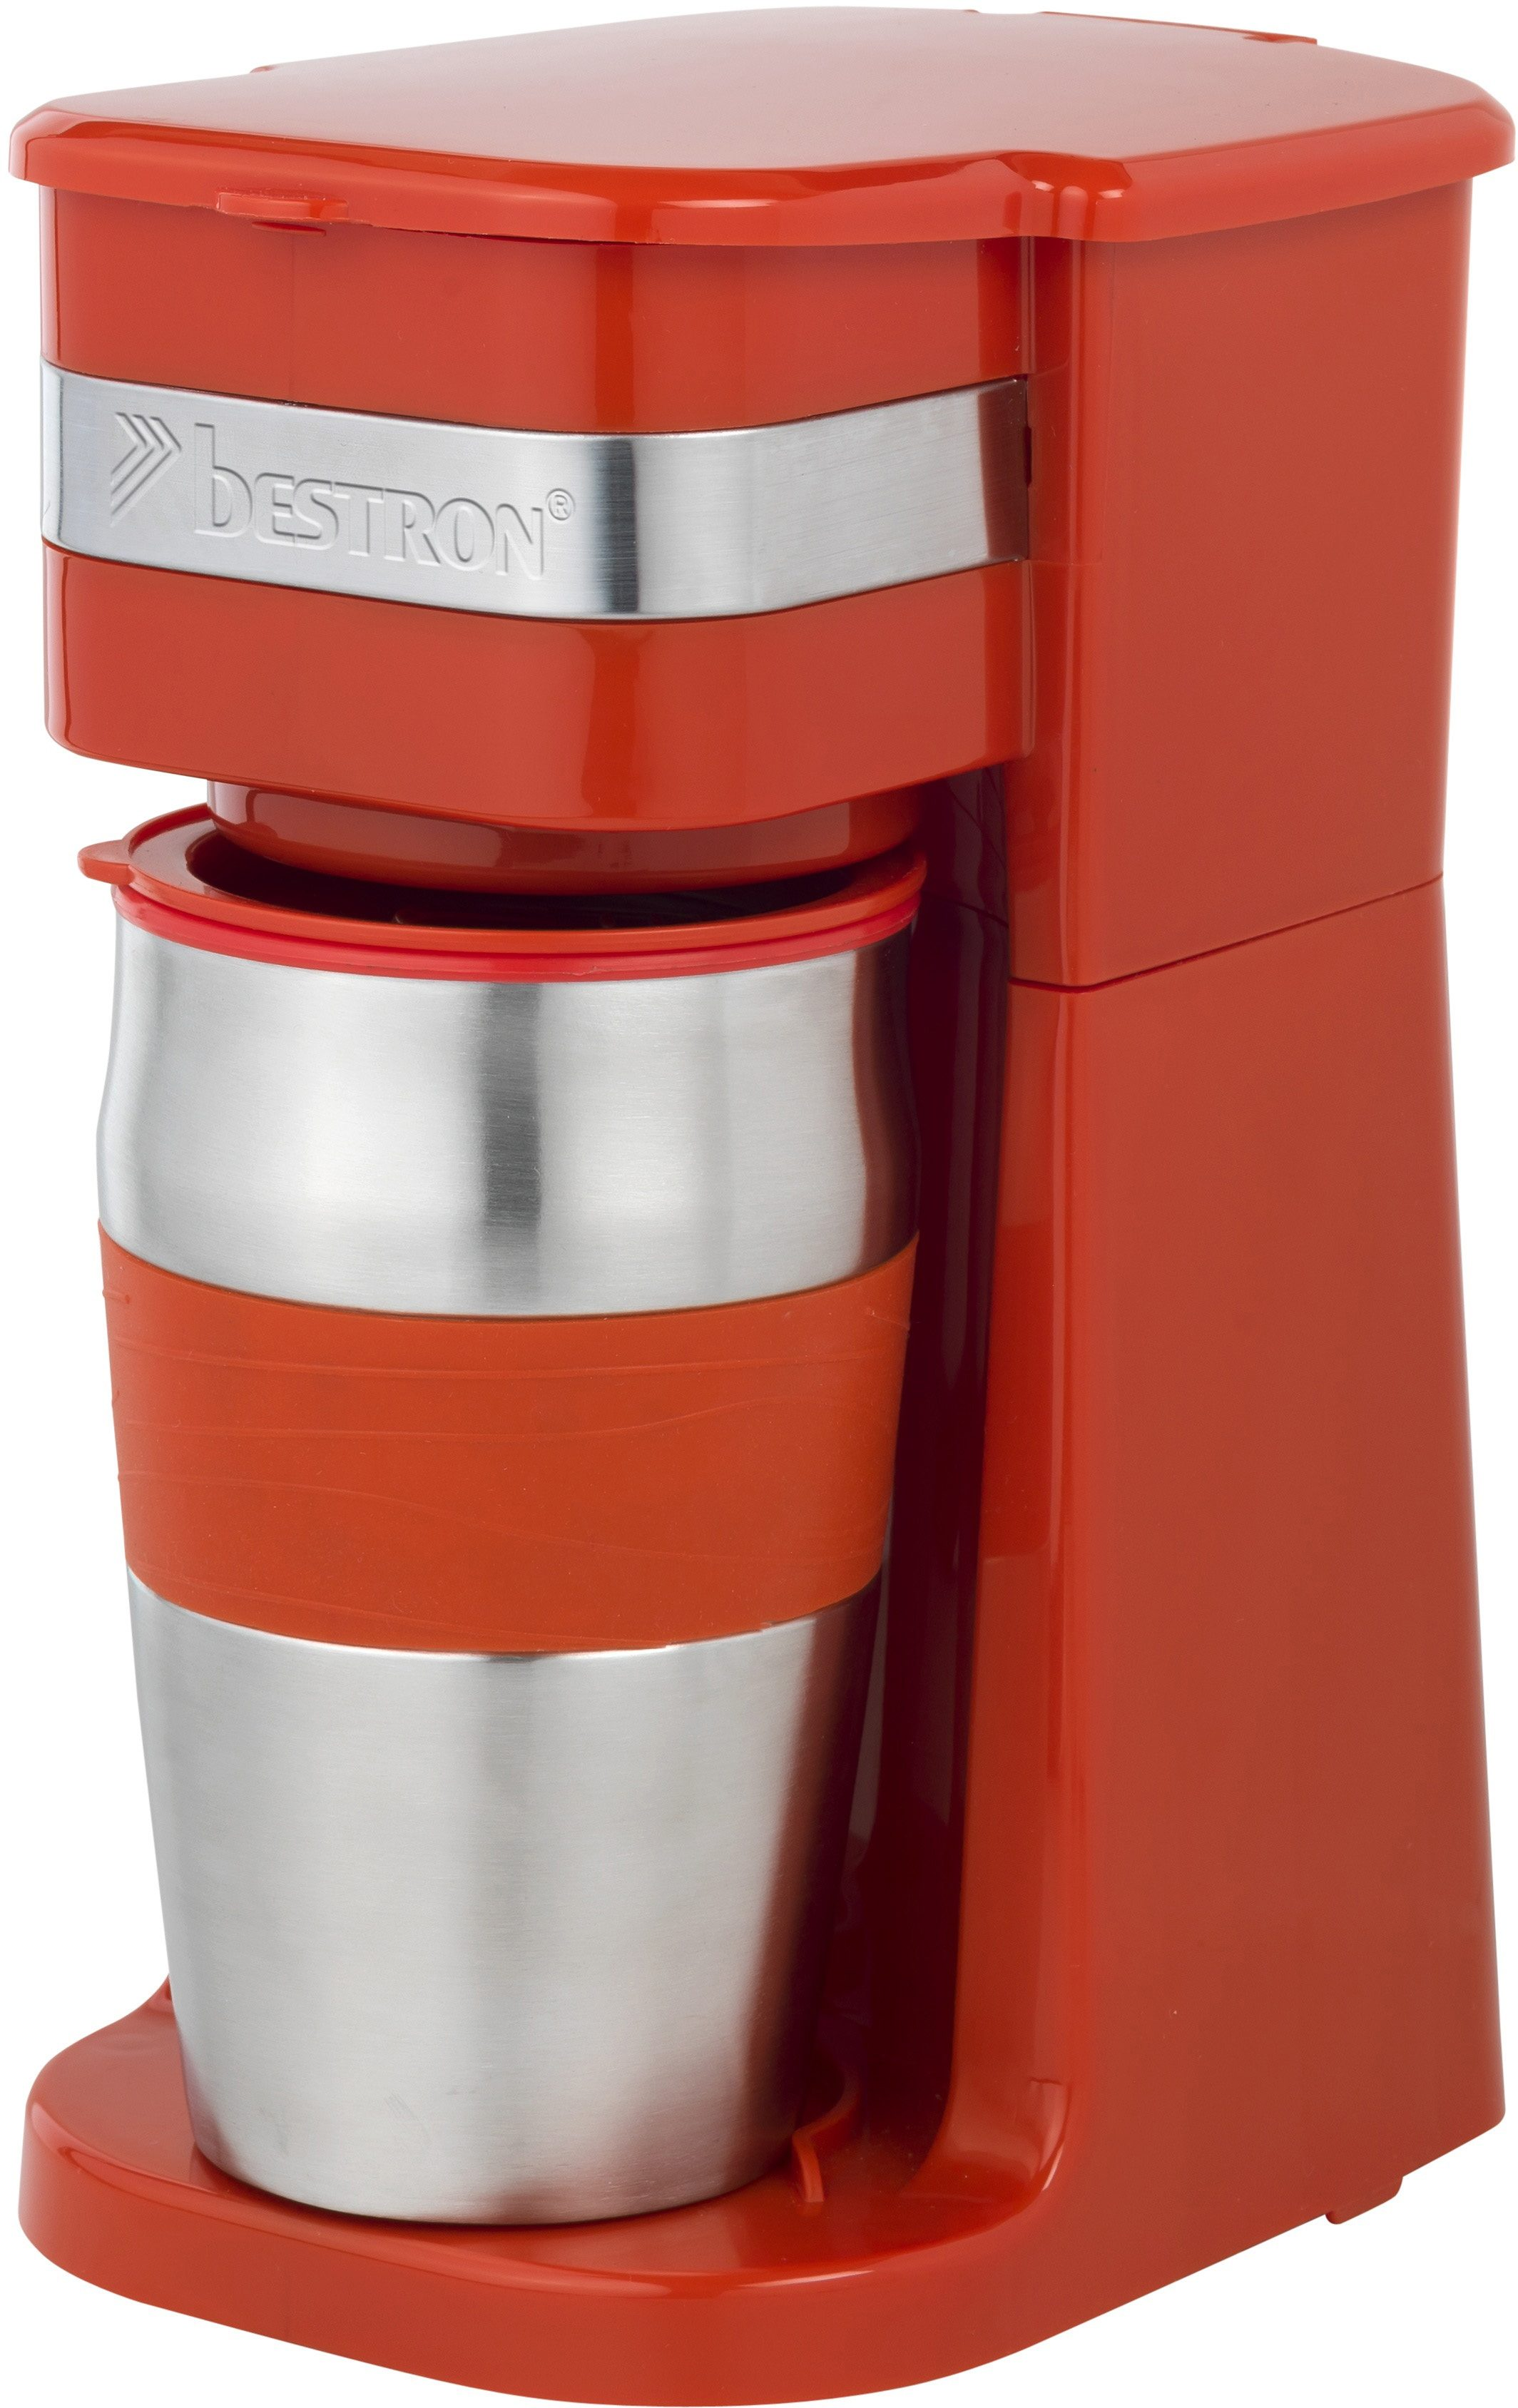 bestron Filterkaffeemaschine ACM111R, Permanentfilter